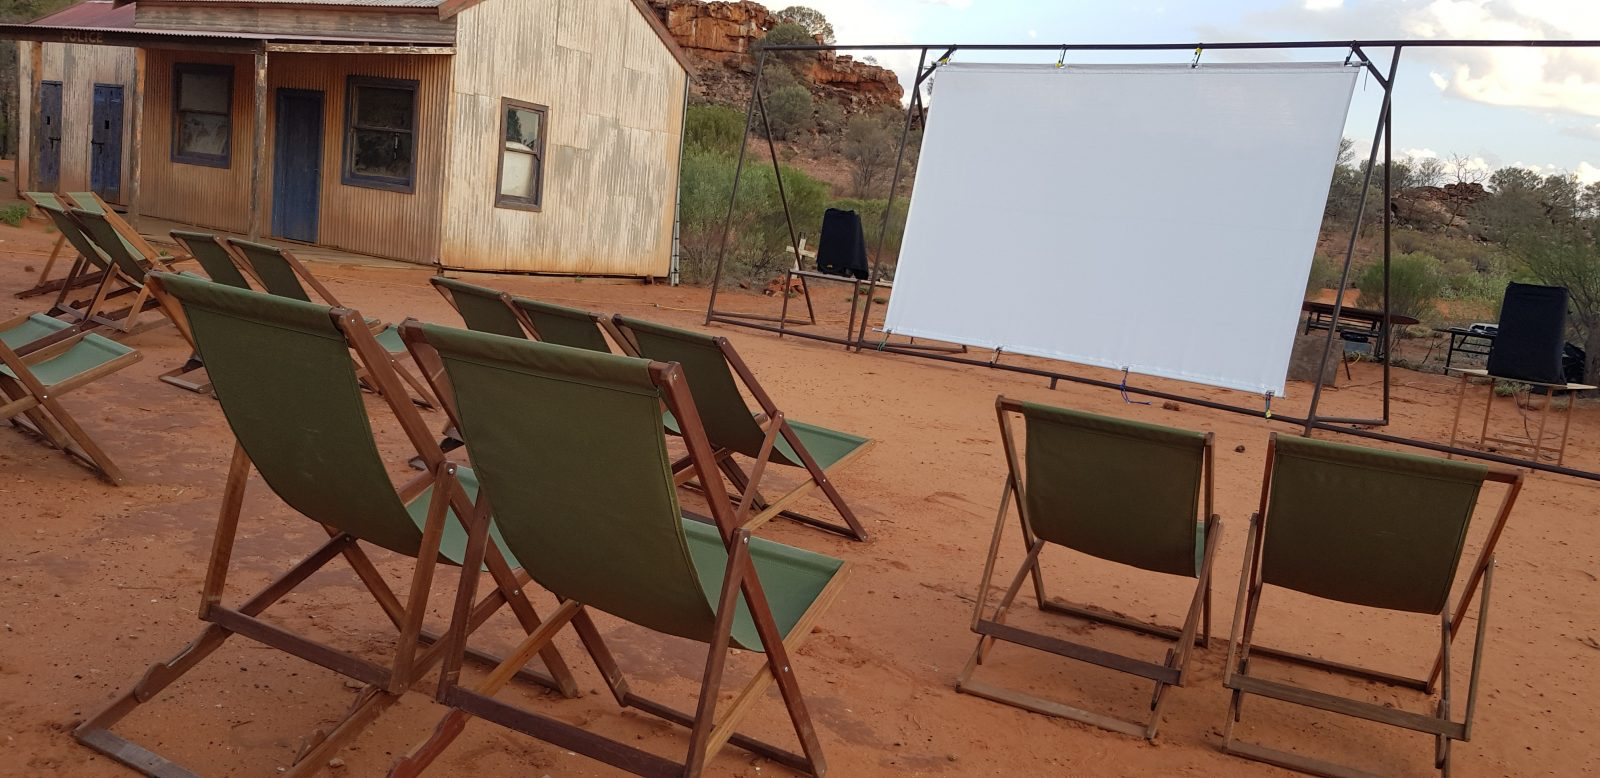 Ooraminna Deckchair Cinema